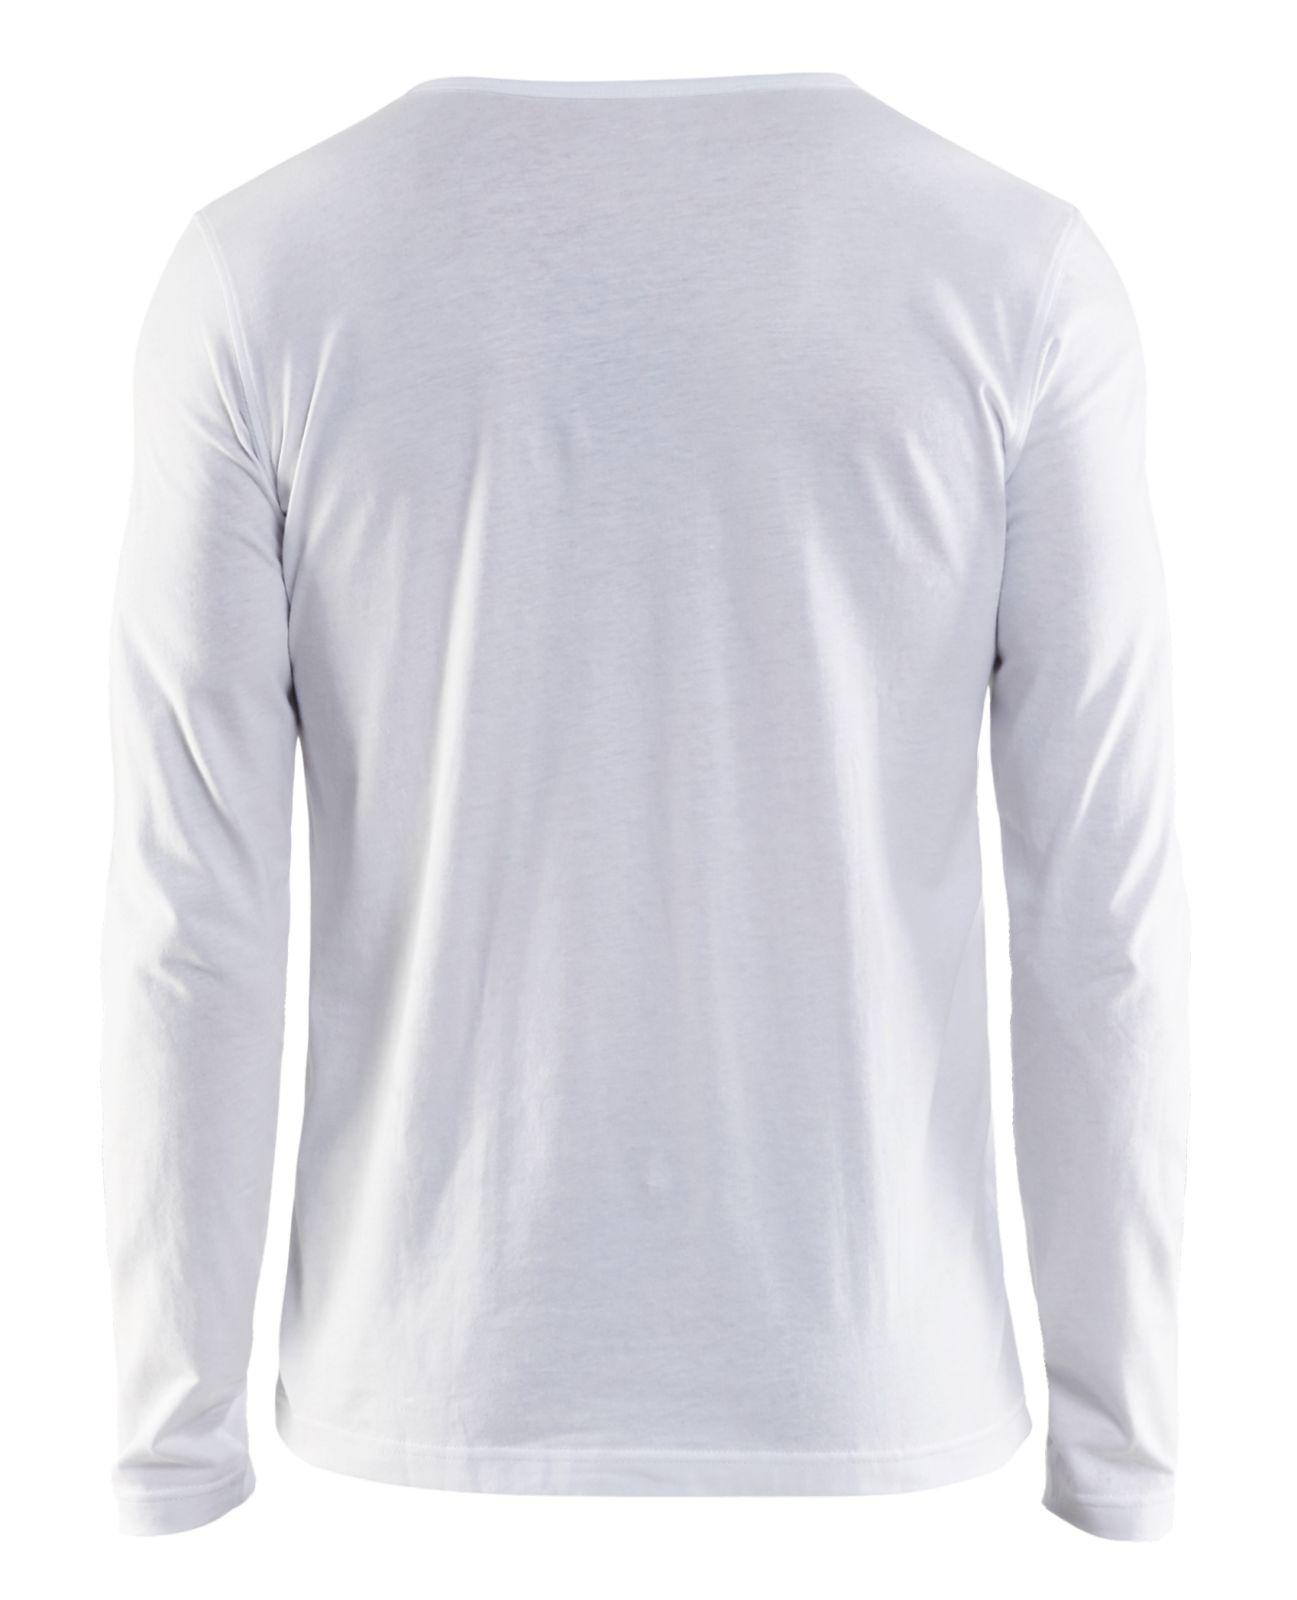 Blaklader T-shirts 35001042 wit(1000)